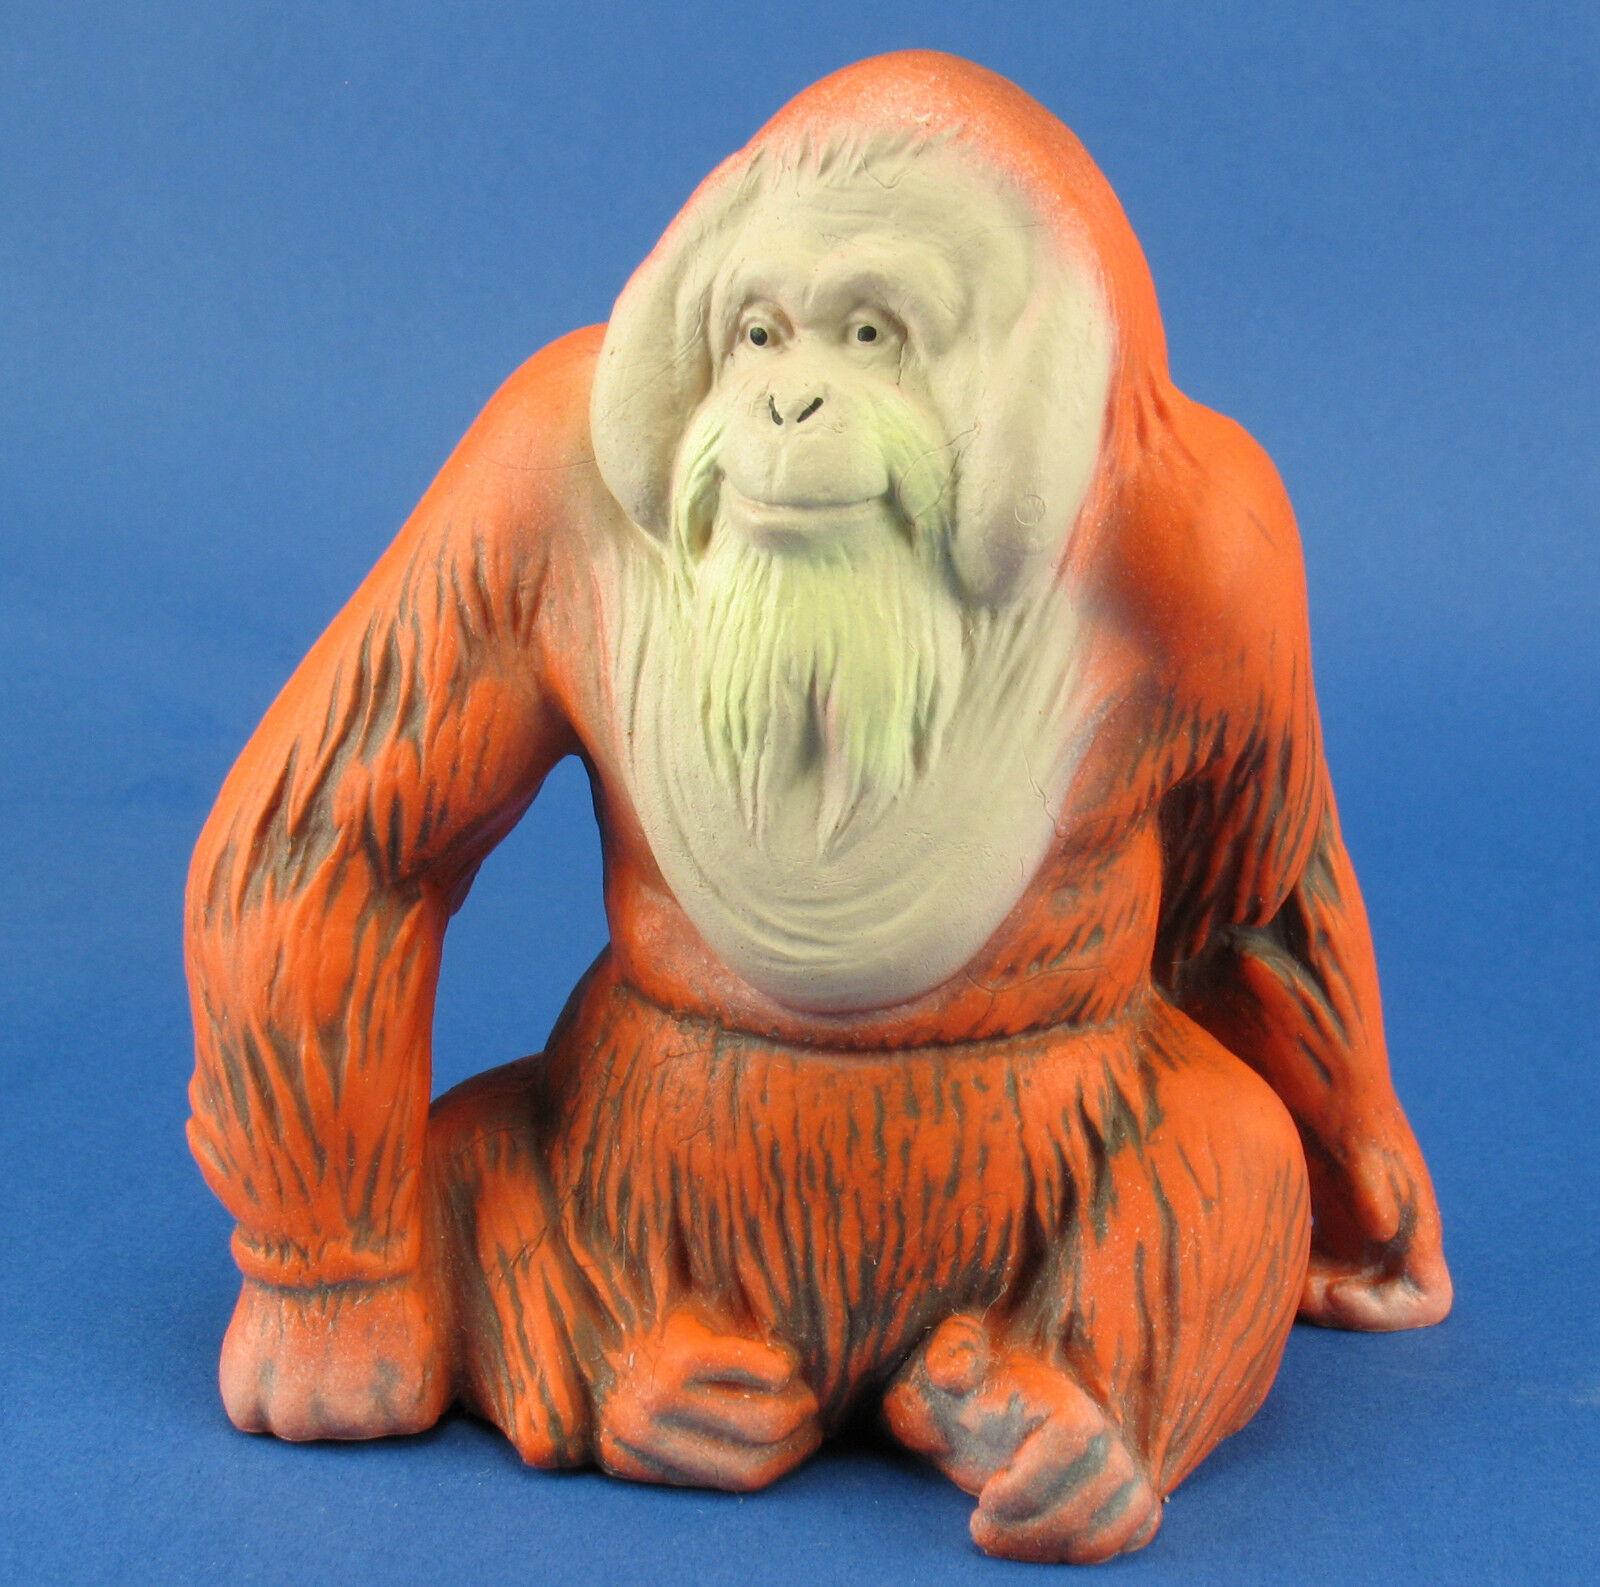 Schleich 15001 - Gorilas - serie del Fondo Mundial para la naturaleza - animales